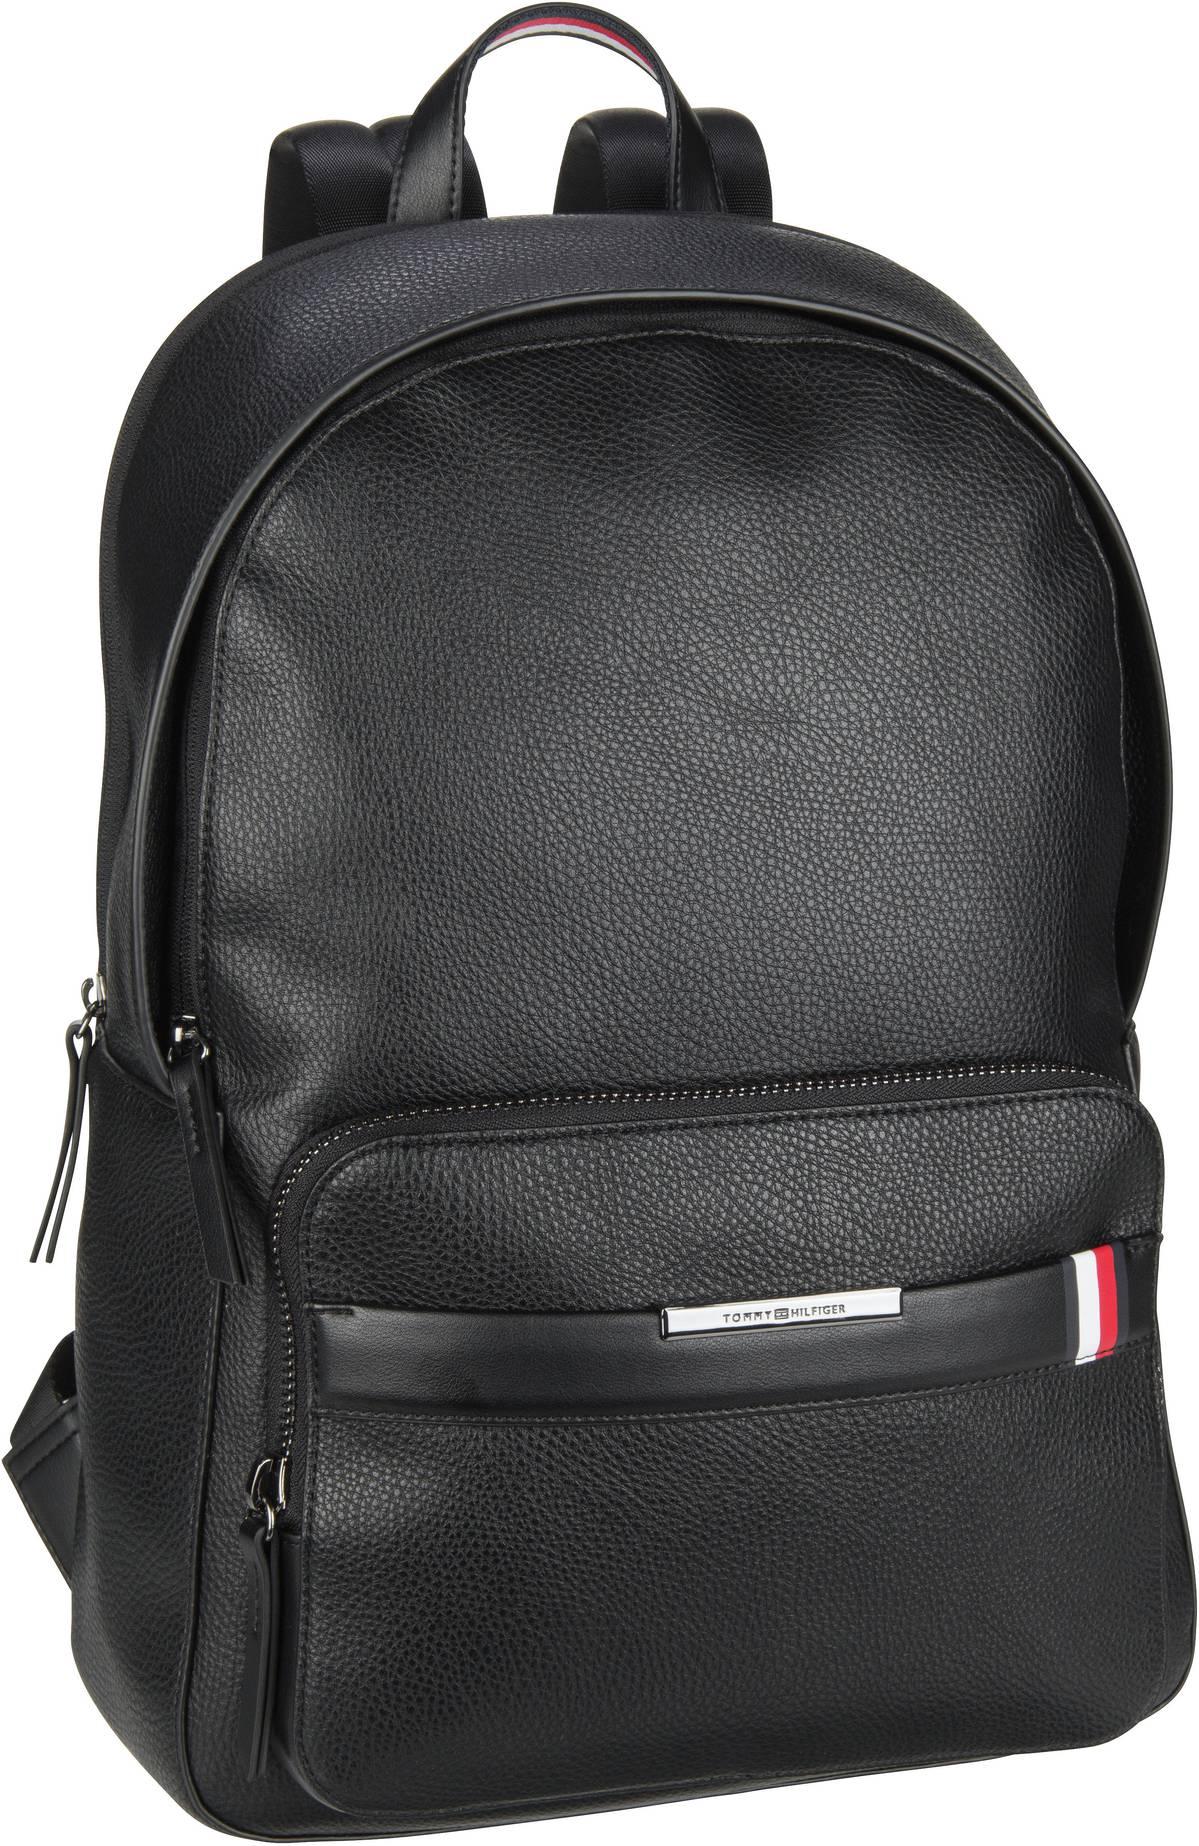 Rucksack / Daypack TH Downtown Backpack 5236 Black